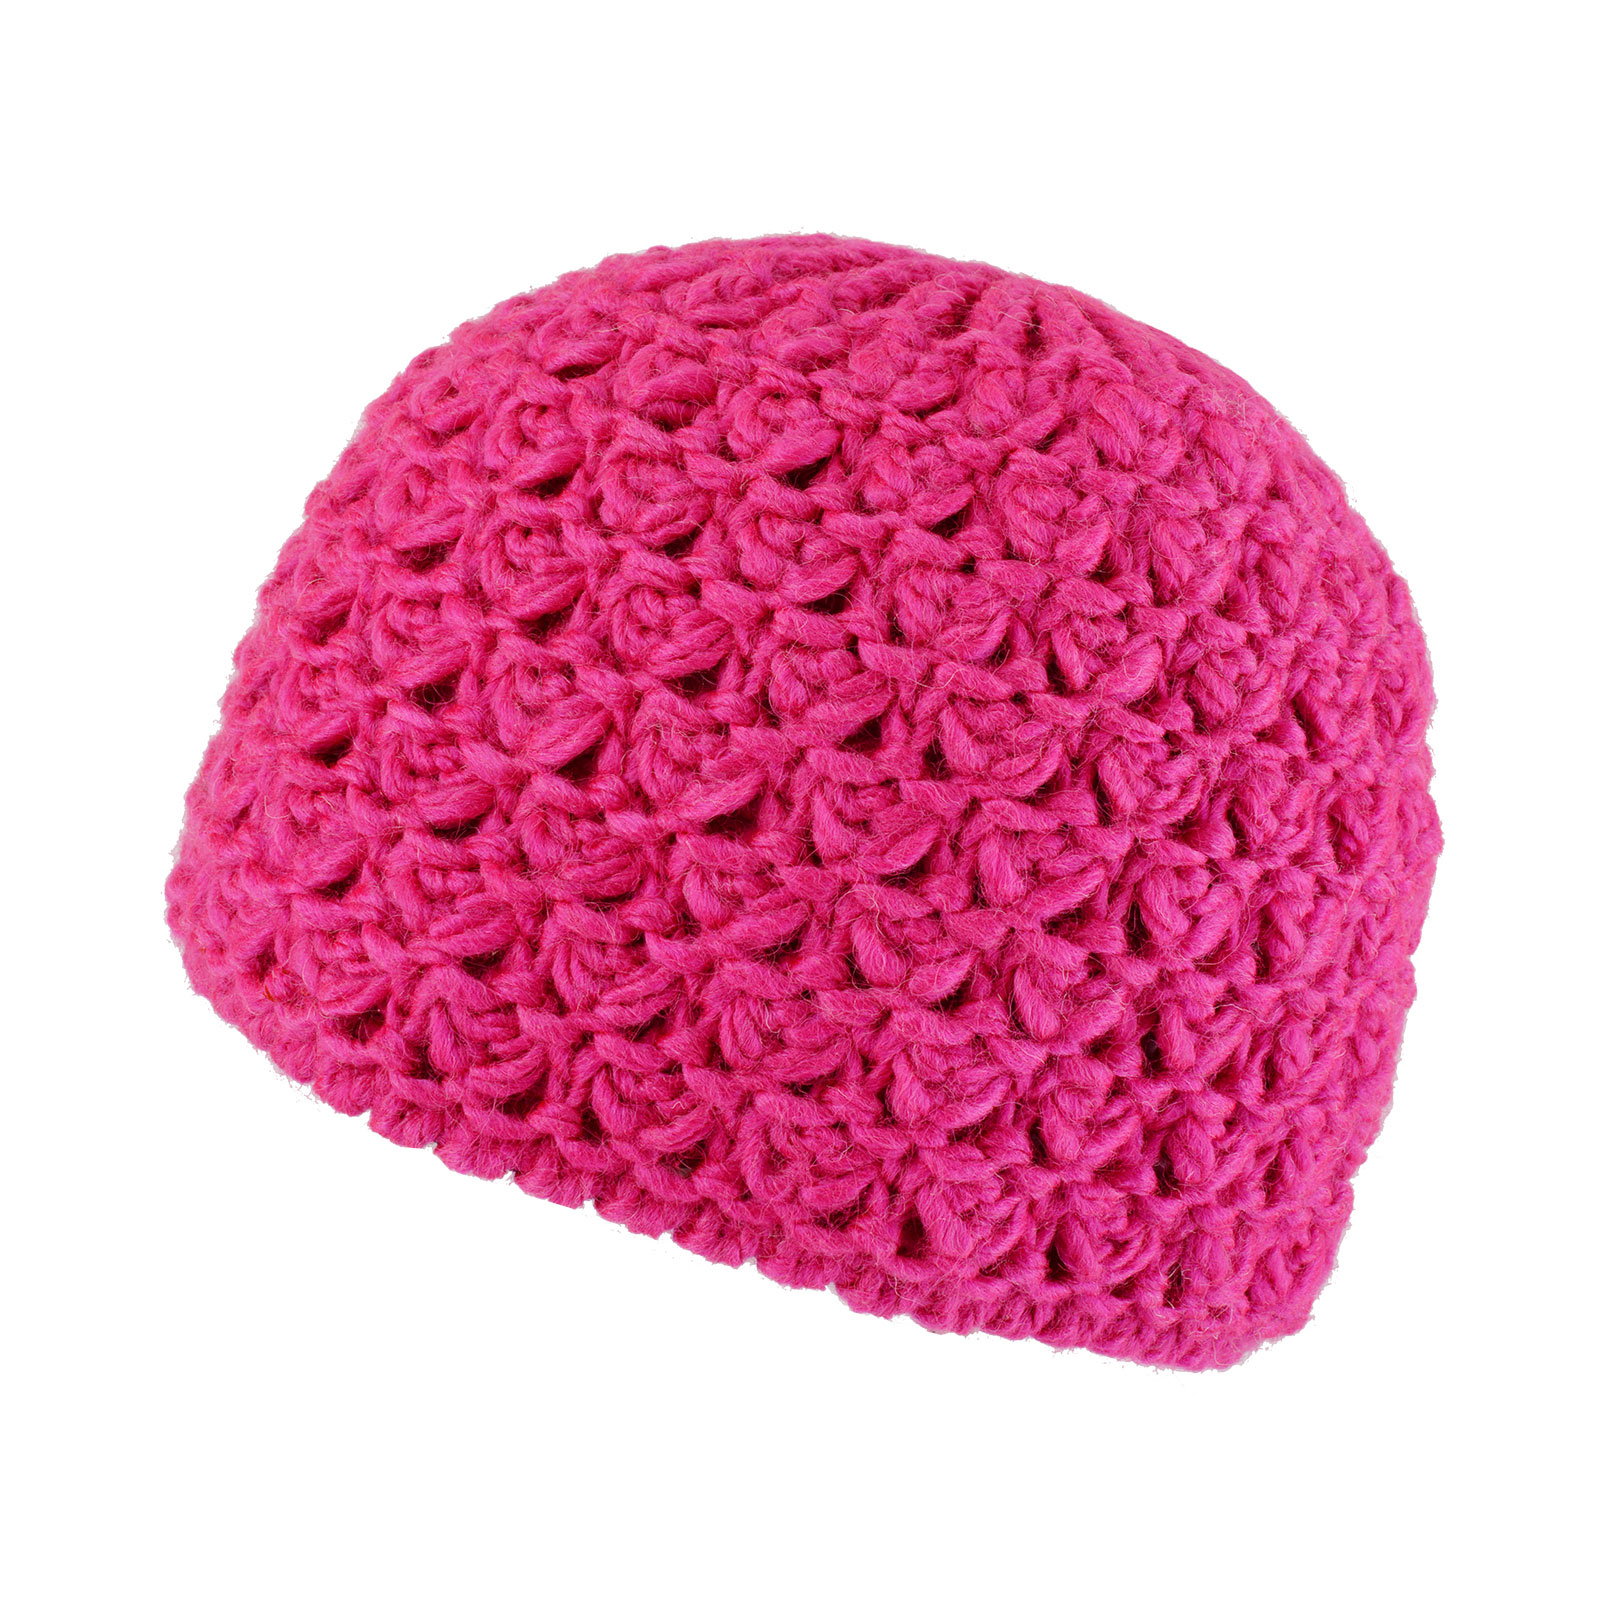 CP-00812-F16-bonnet-court-femme-maille-rose-fuchsia